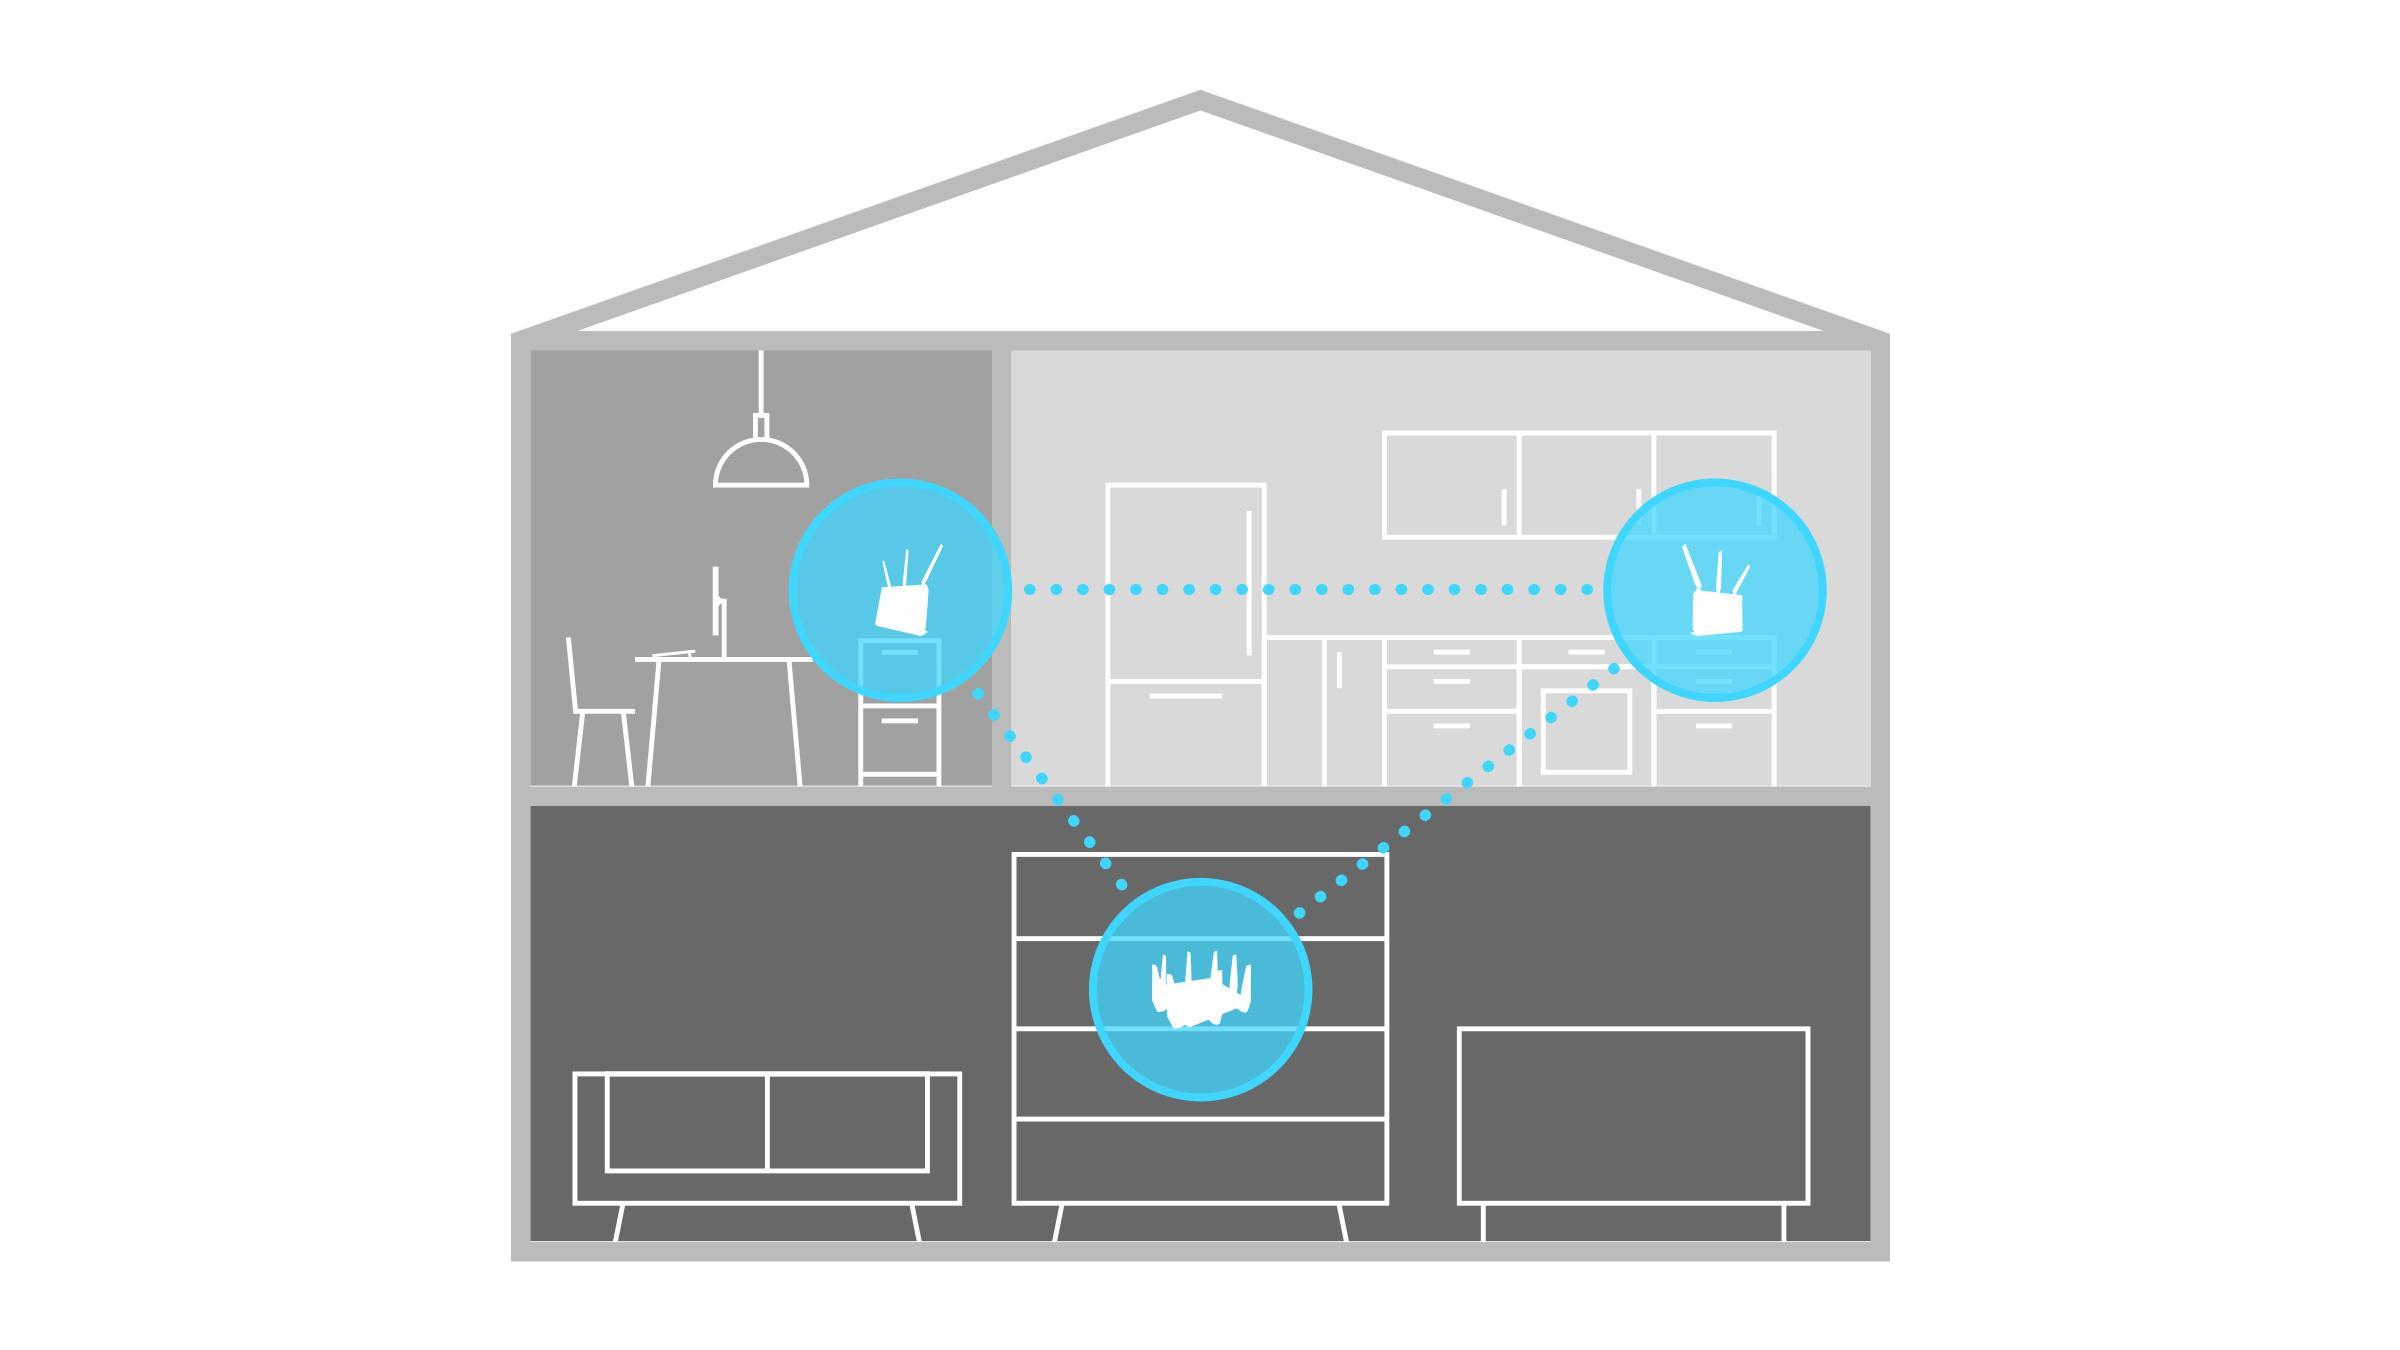 Asus Dual Band Gigabit Wifi Gaming 500pxsecondarycelldiagramjpeg View Larger